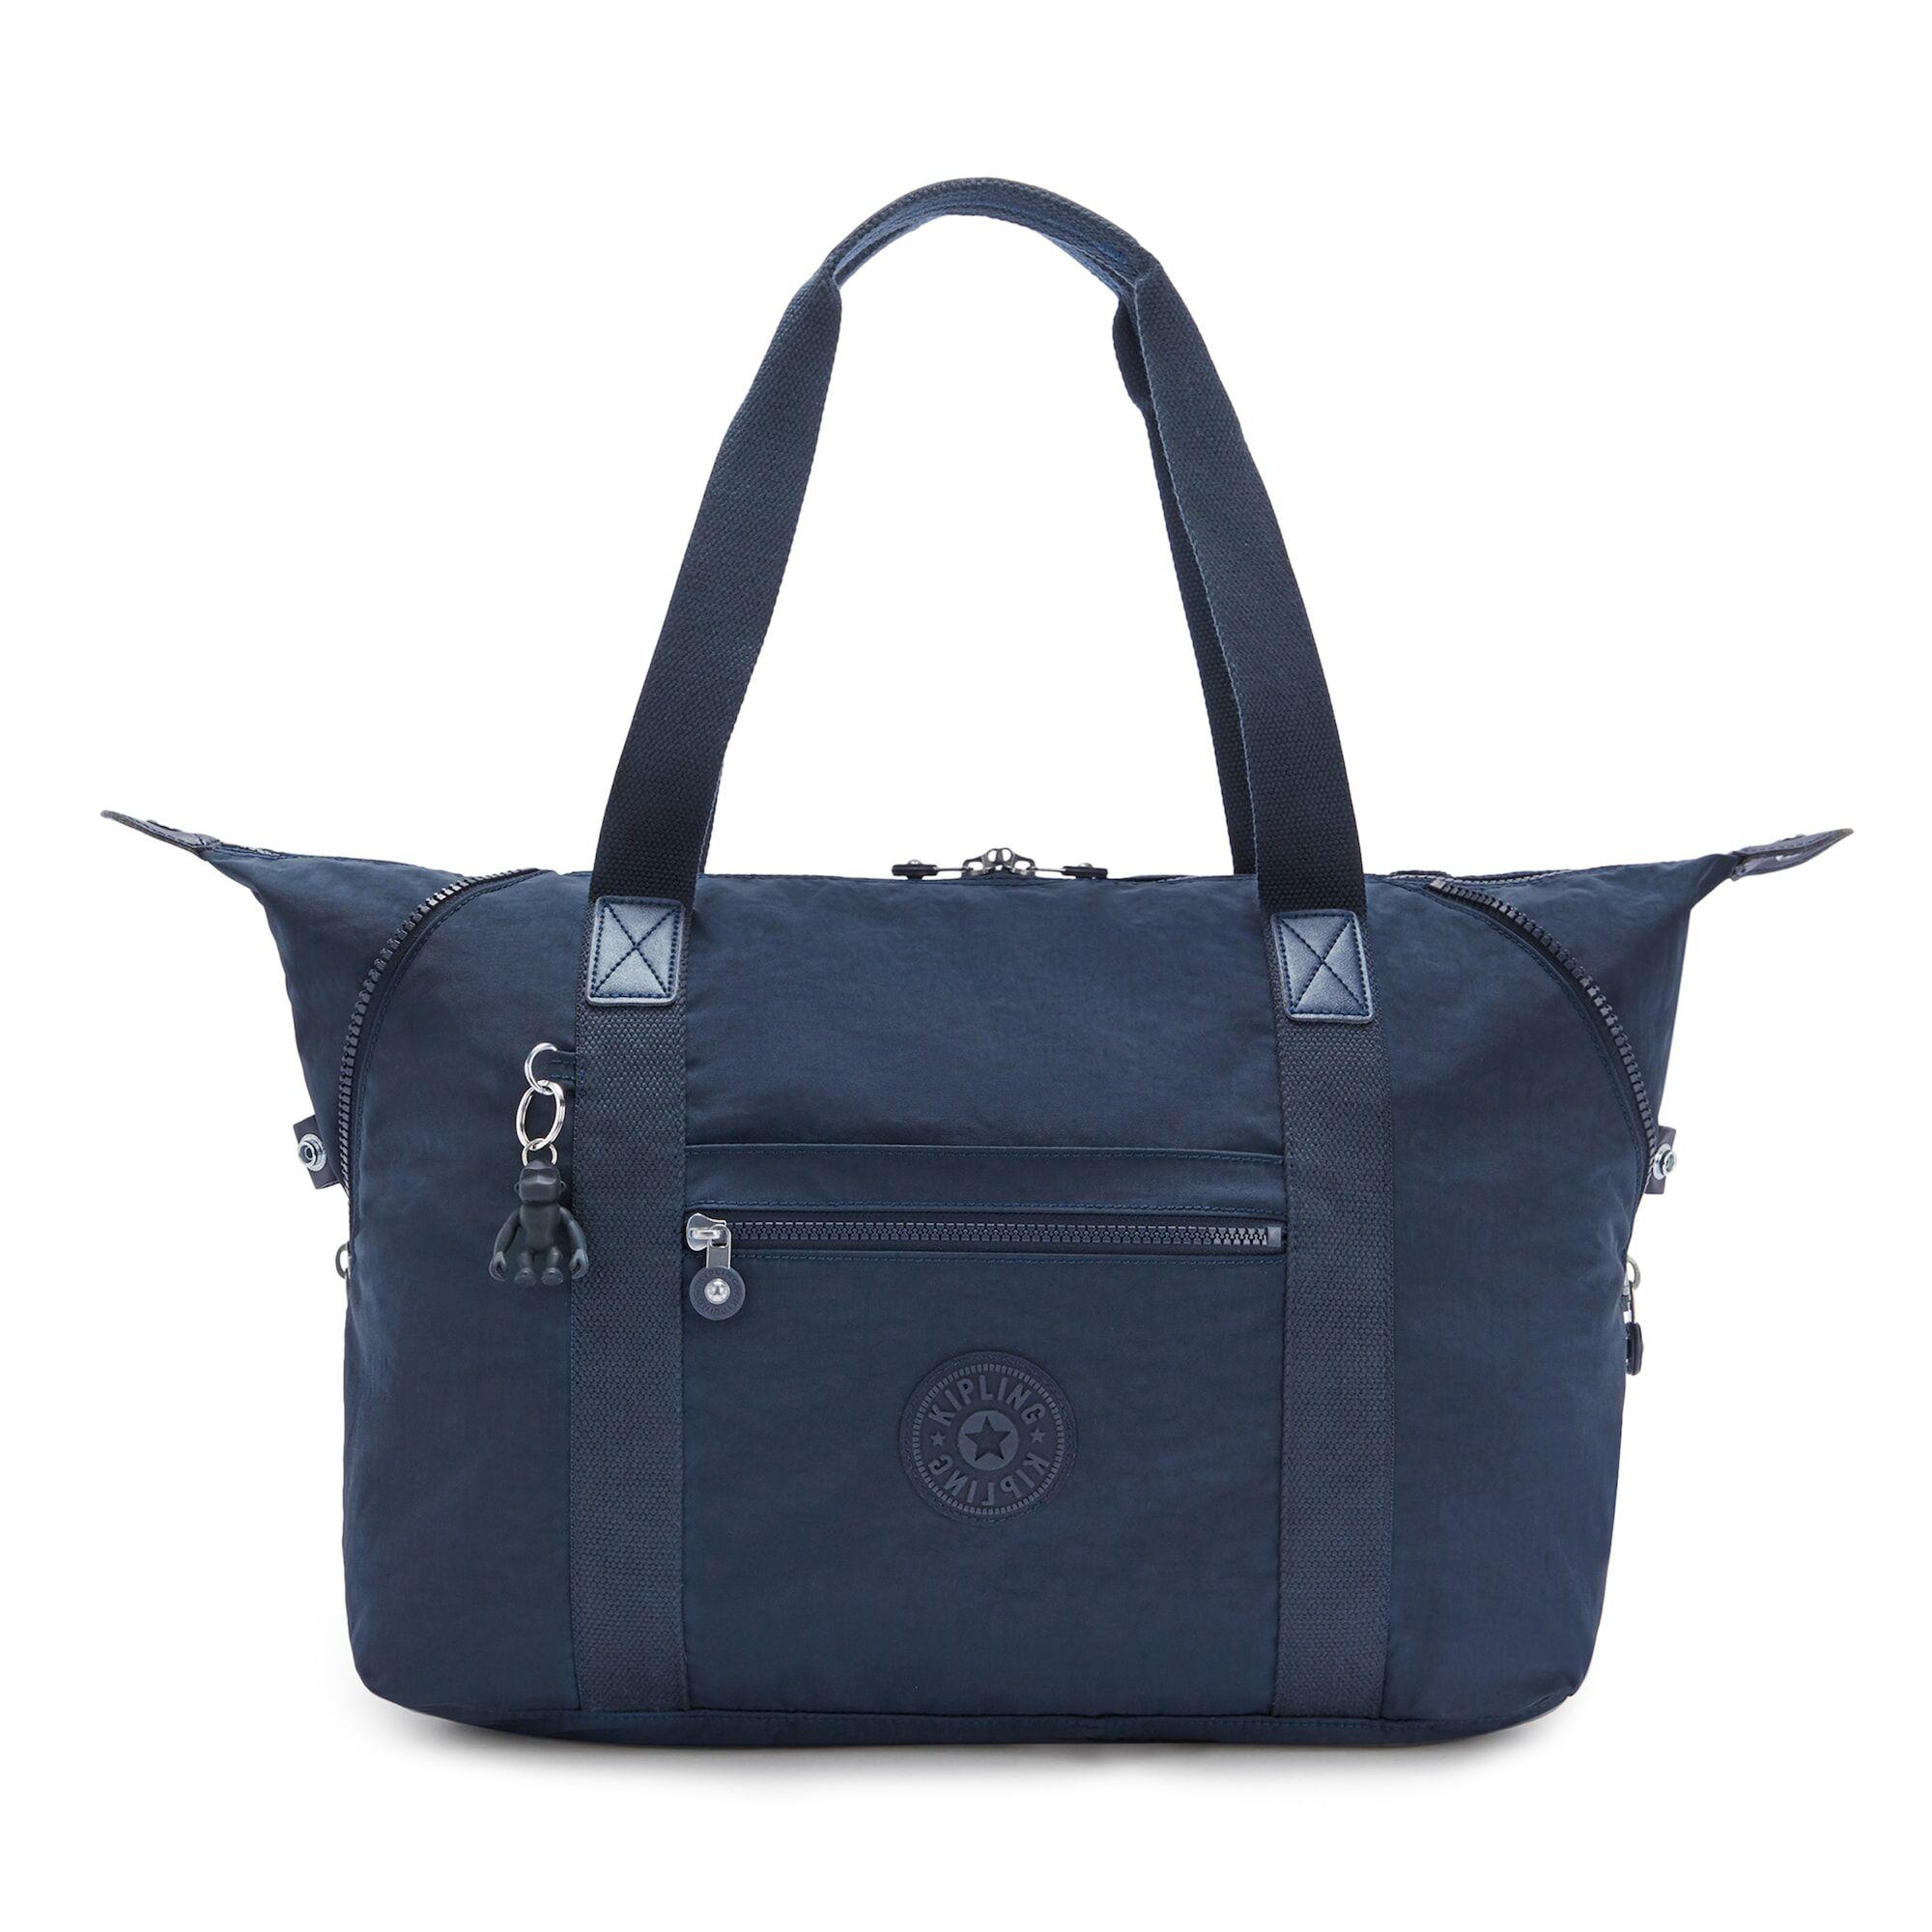 KIPLING Bolsa de fin de semana Azul